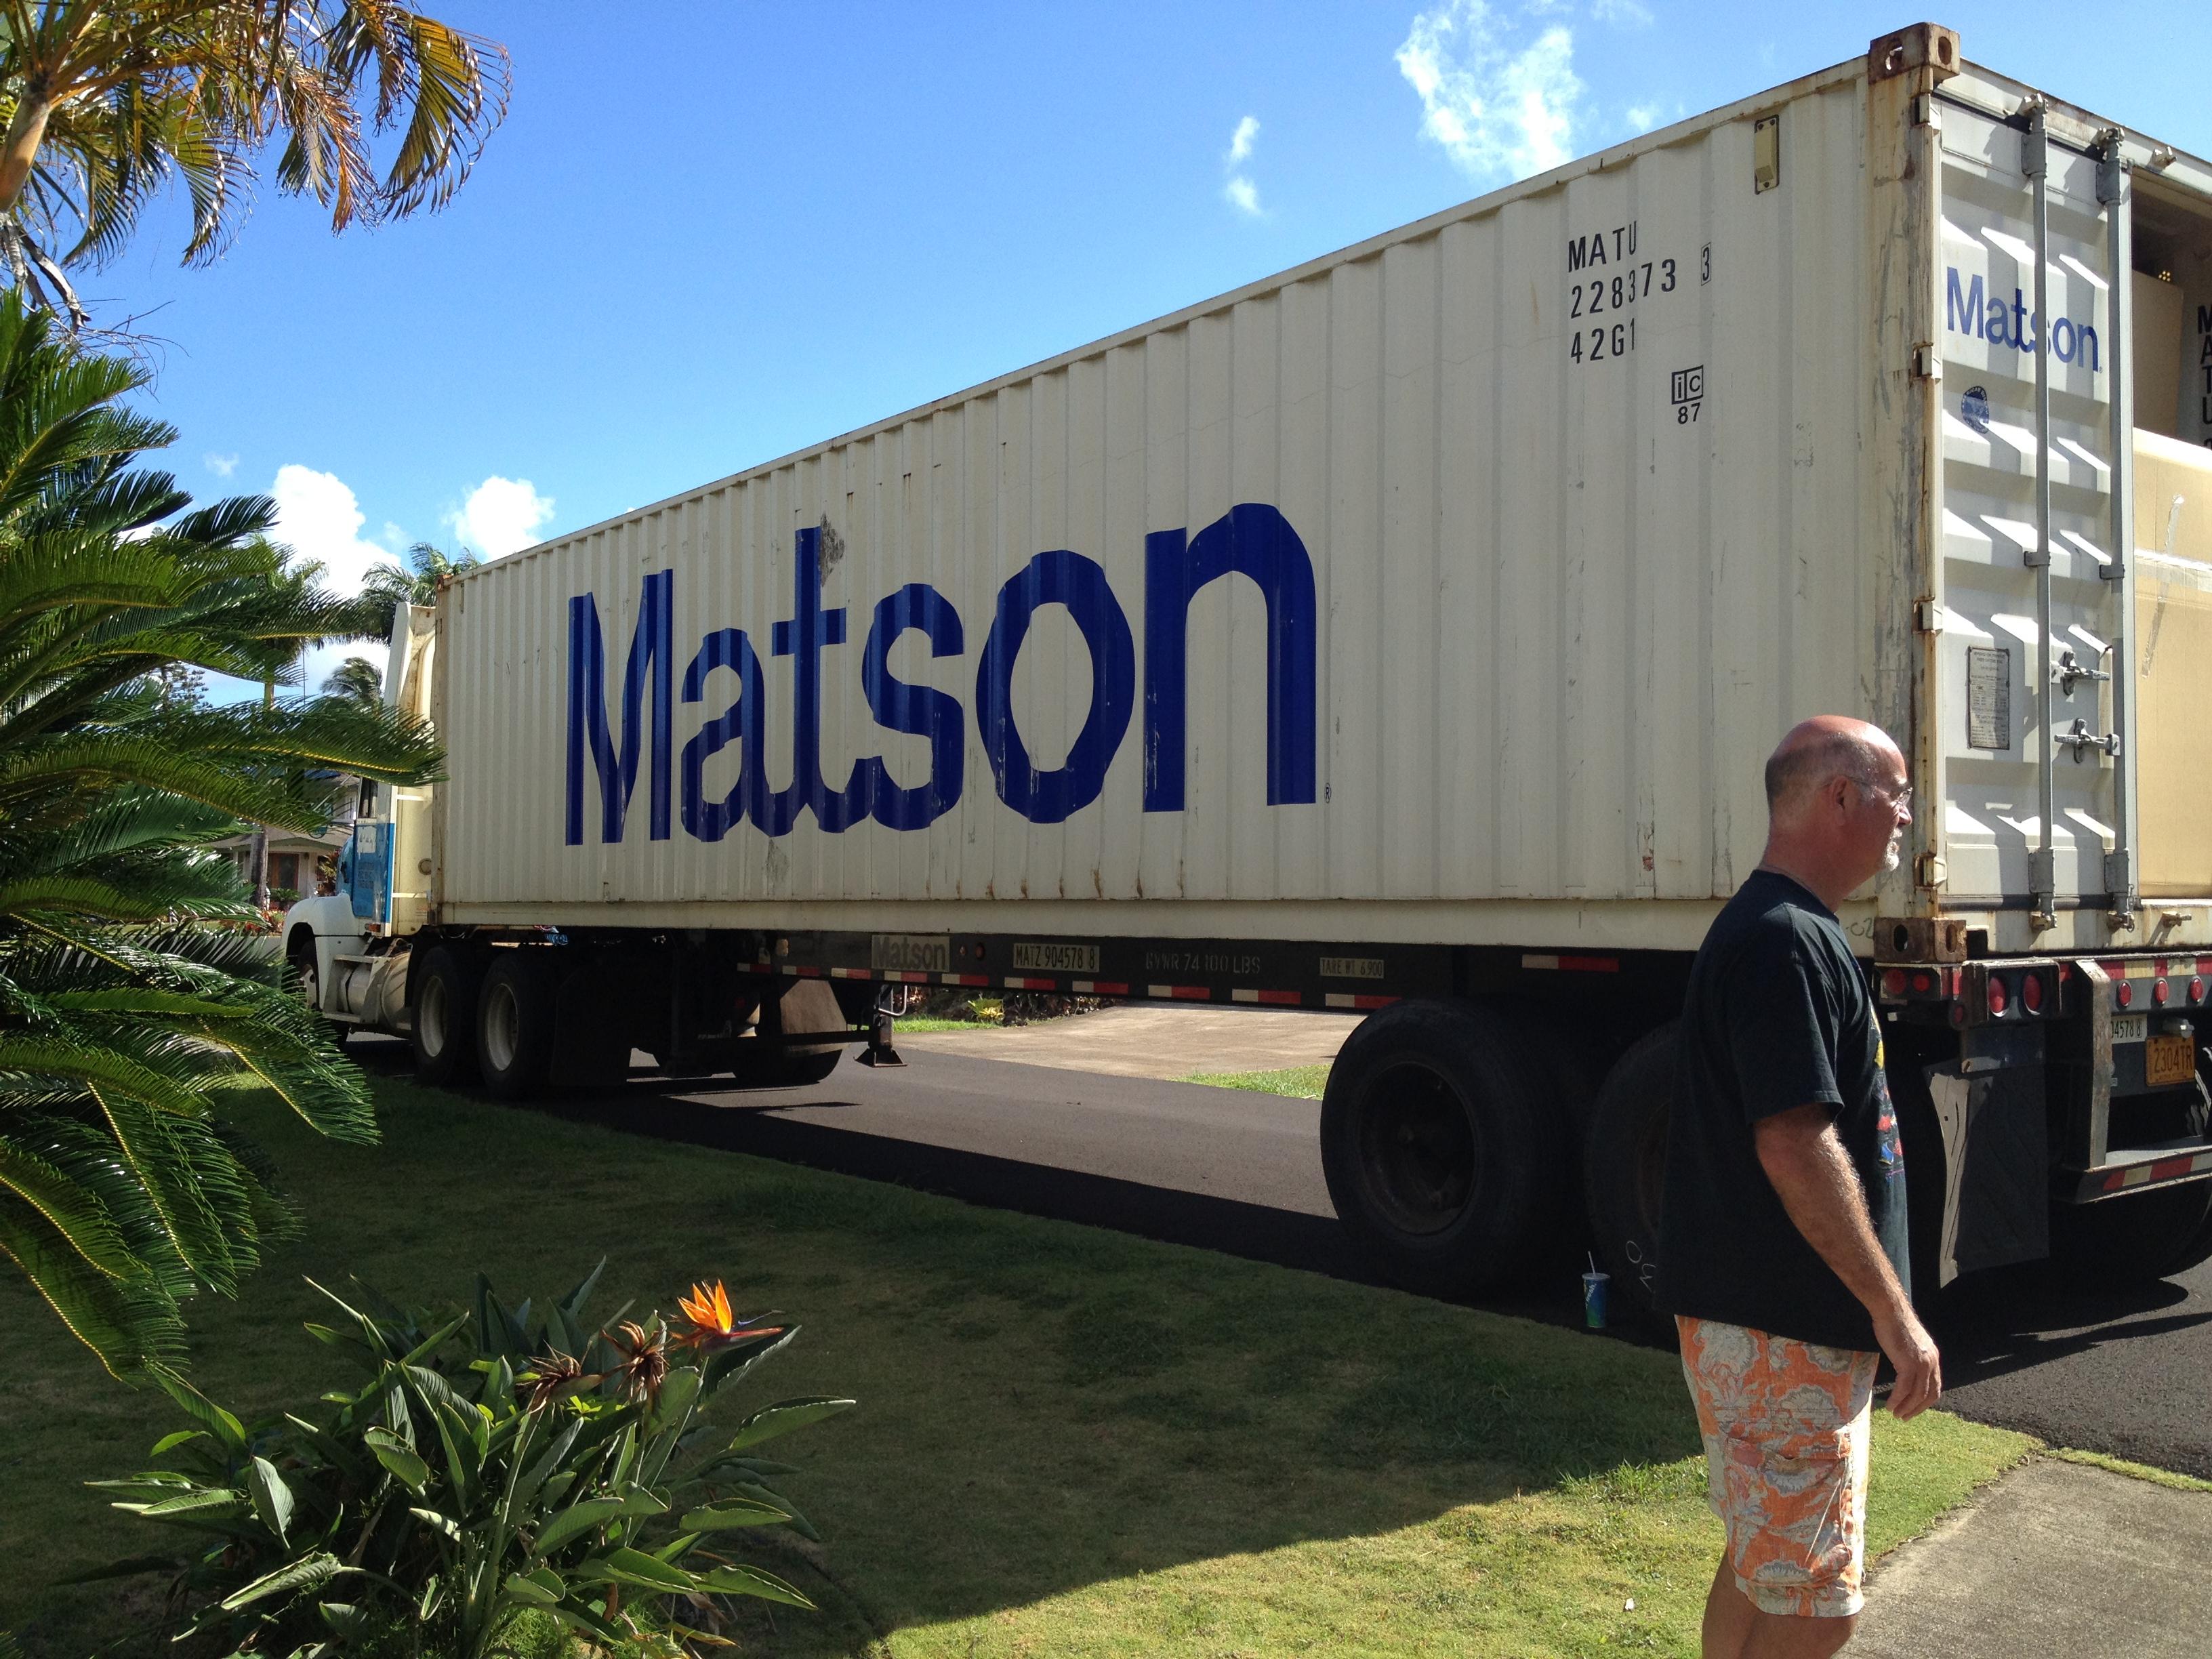 The metamorphosis from house to home kauai greenhorn - Matson container homes ...